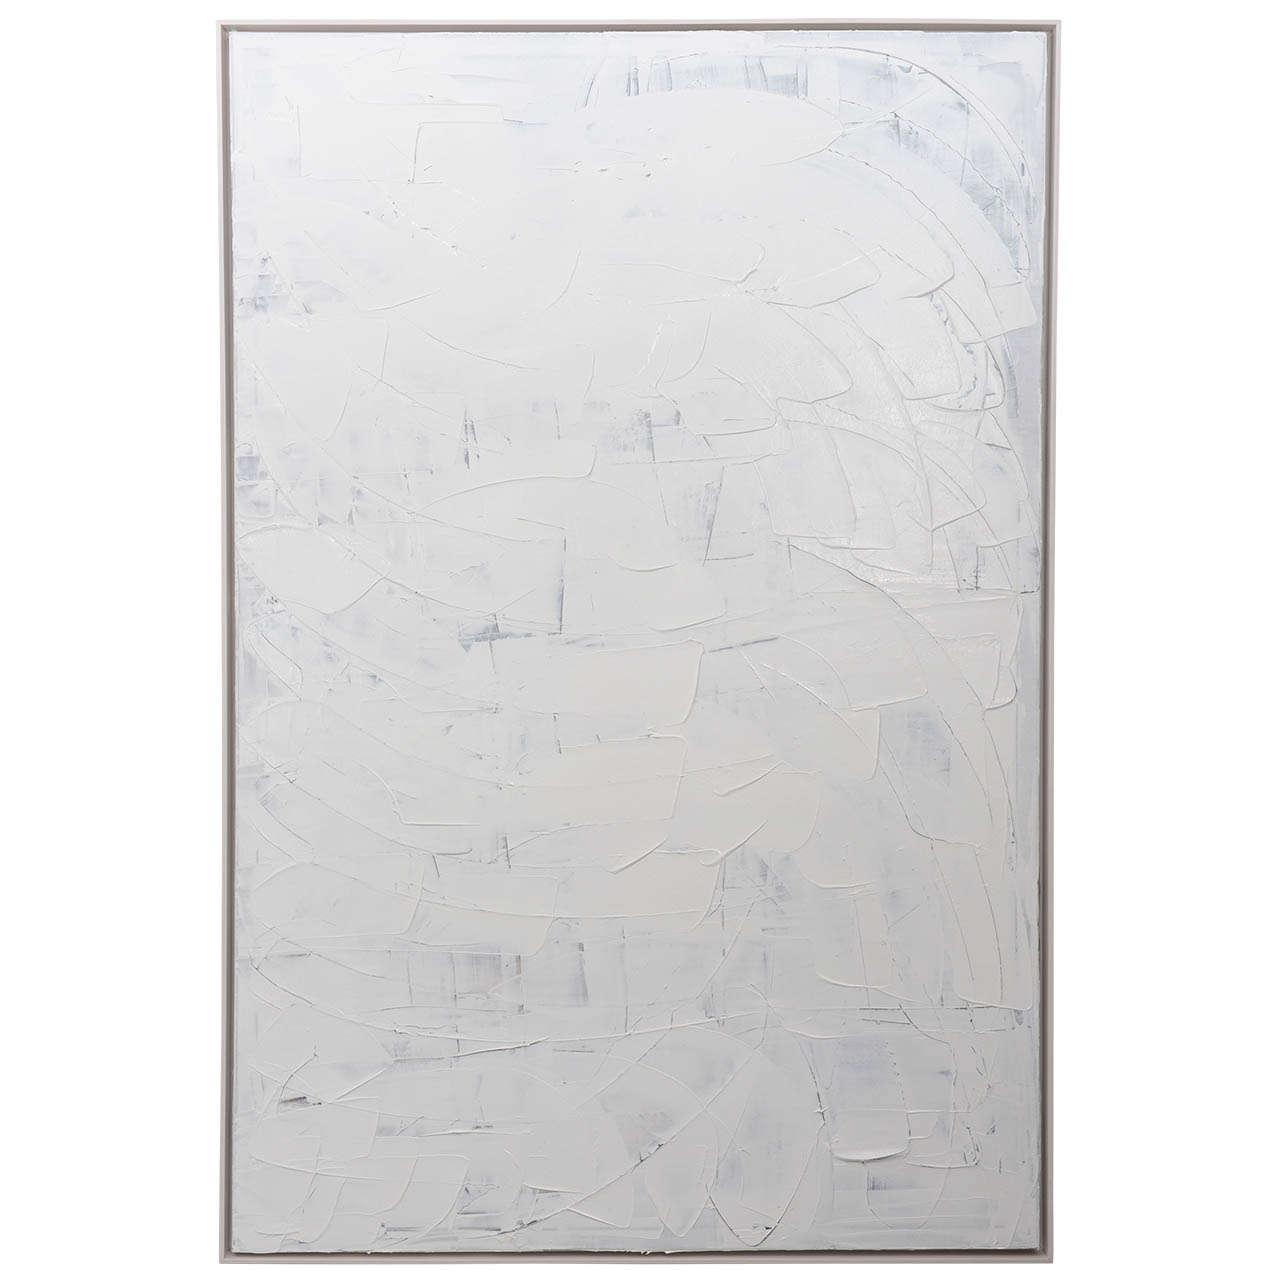 Abstract Expressionist Oil on Canvas, Renato Freitas